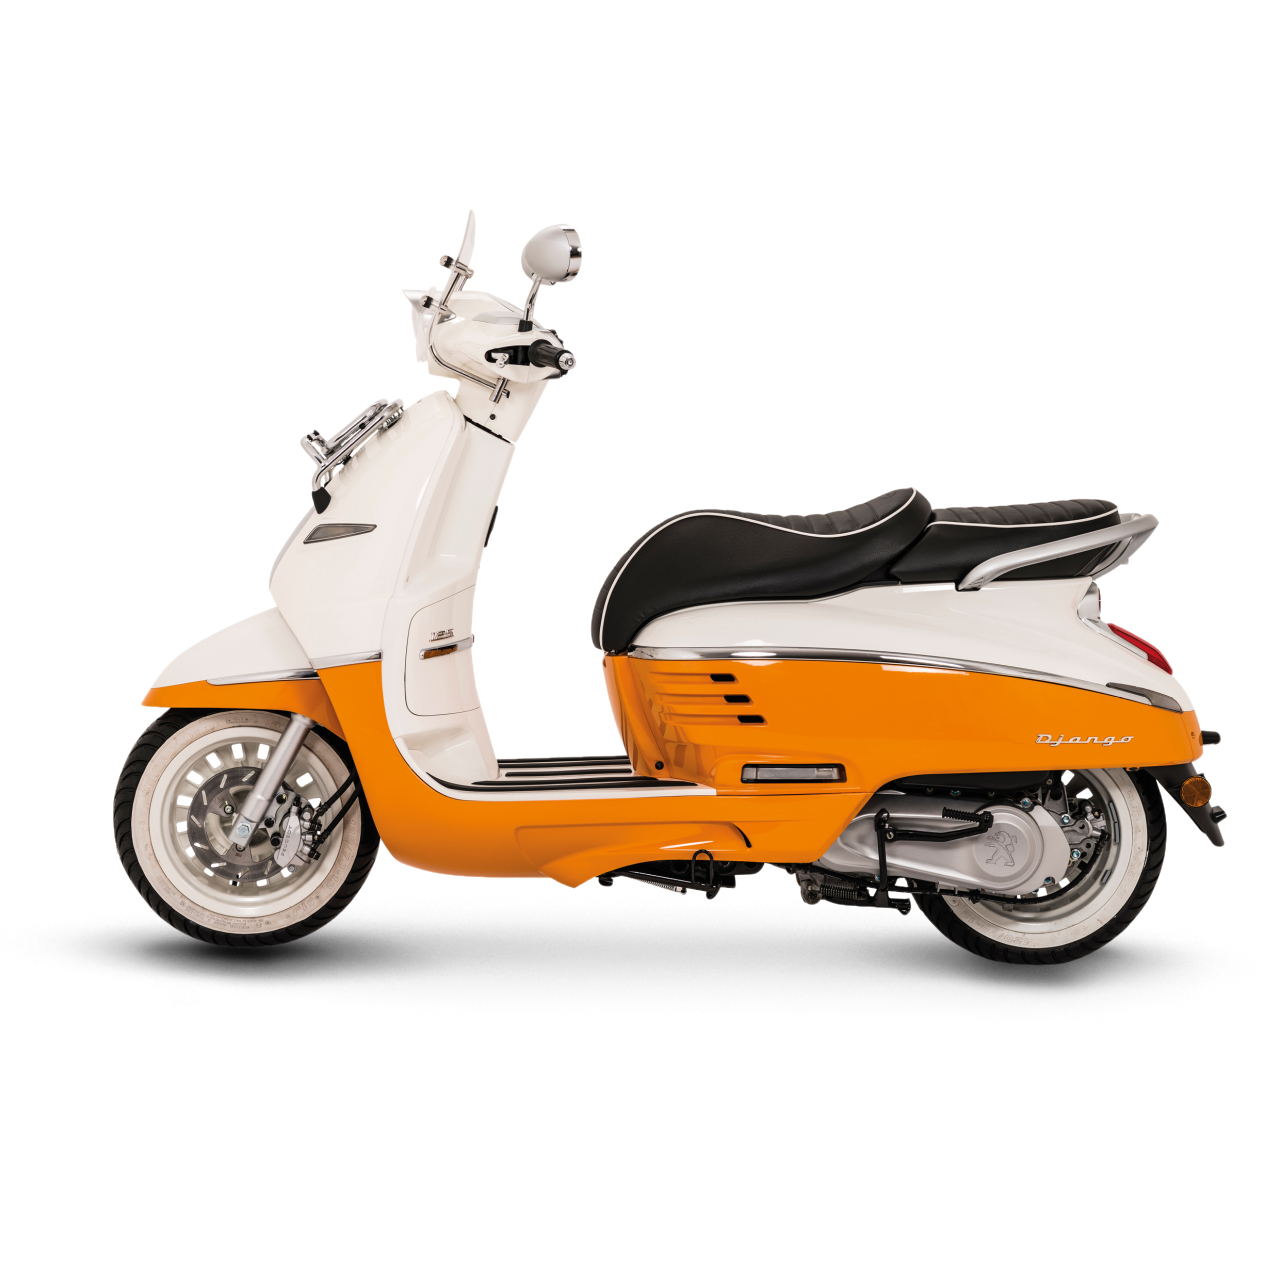 essai du scooter n o r tro peugeot 125 django photo 15 l 39 argus. Black Bedroom Furniture Sets. Home Design Ideas